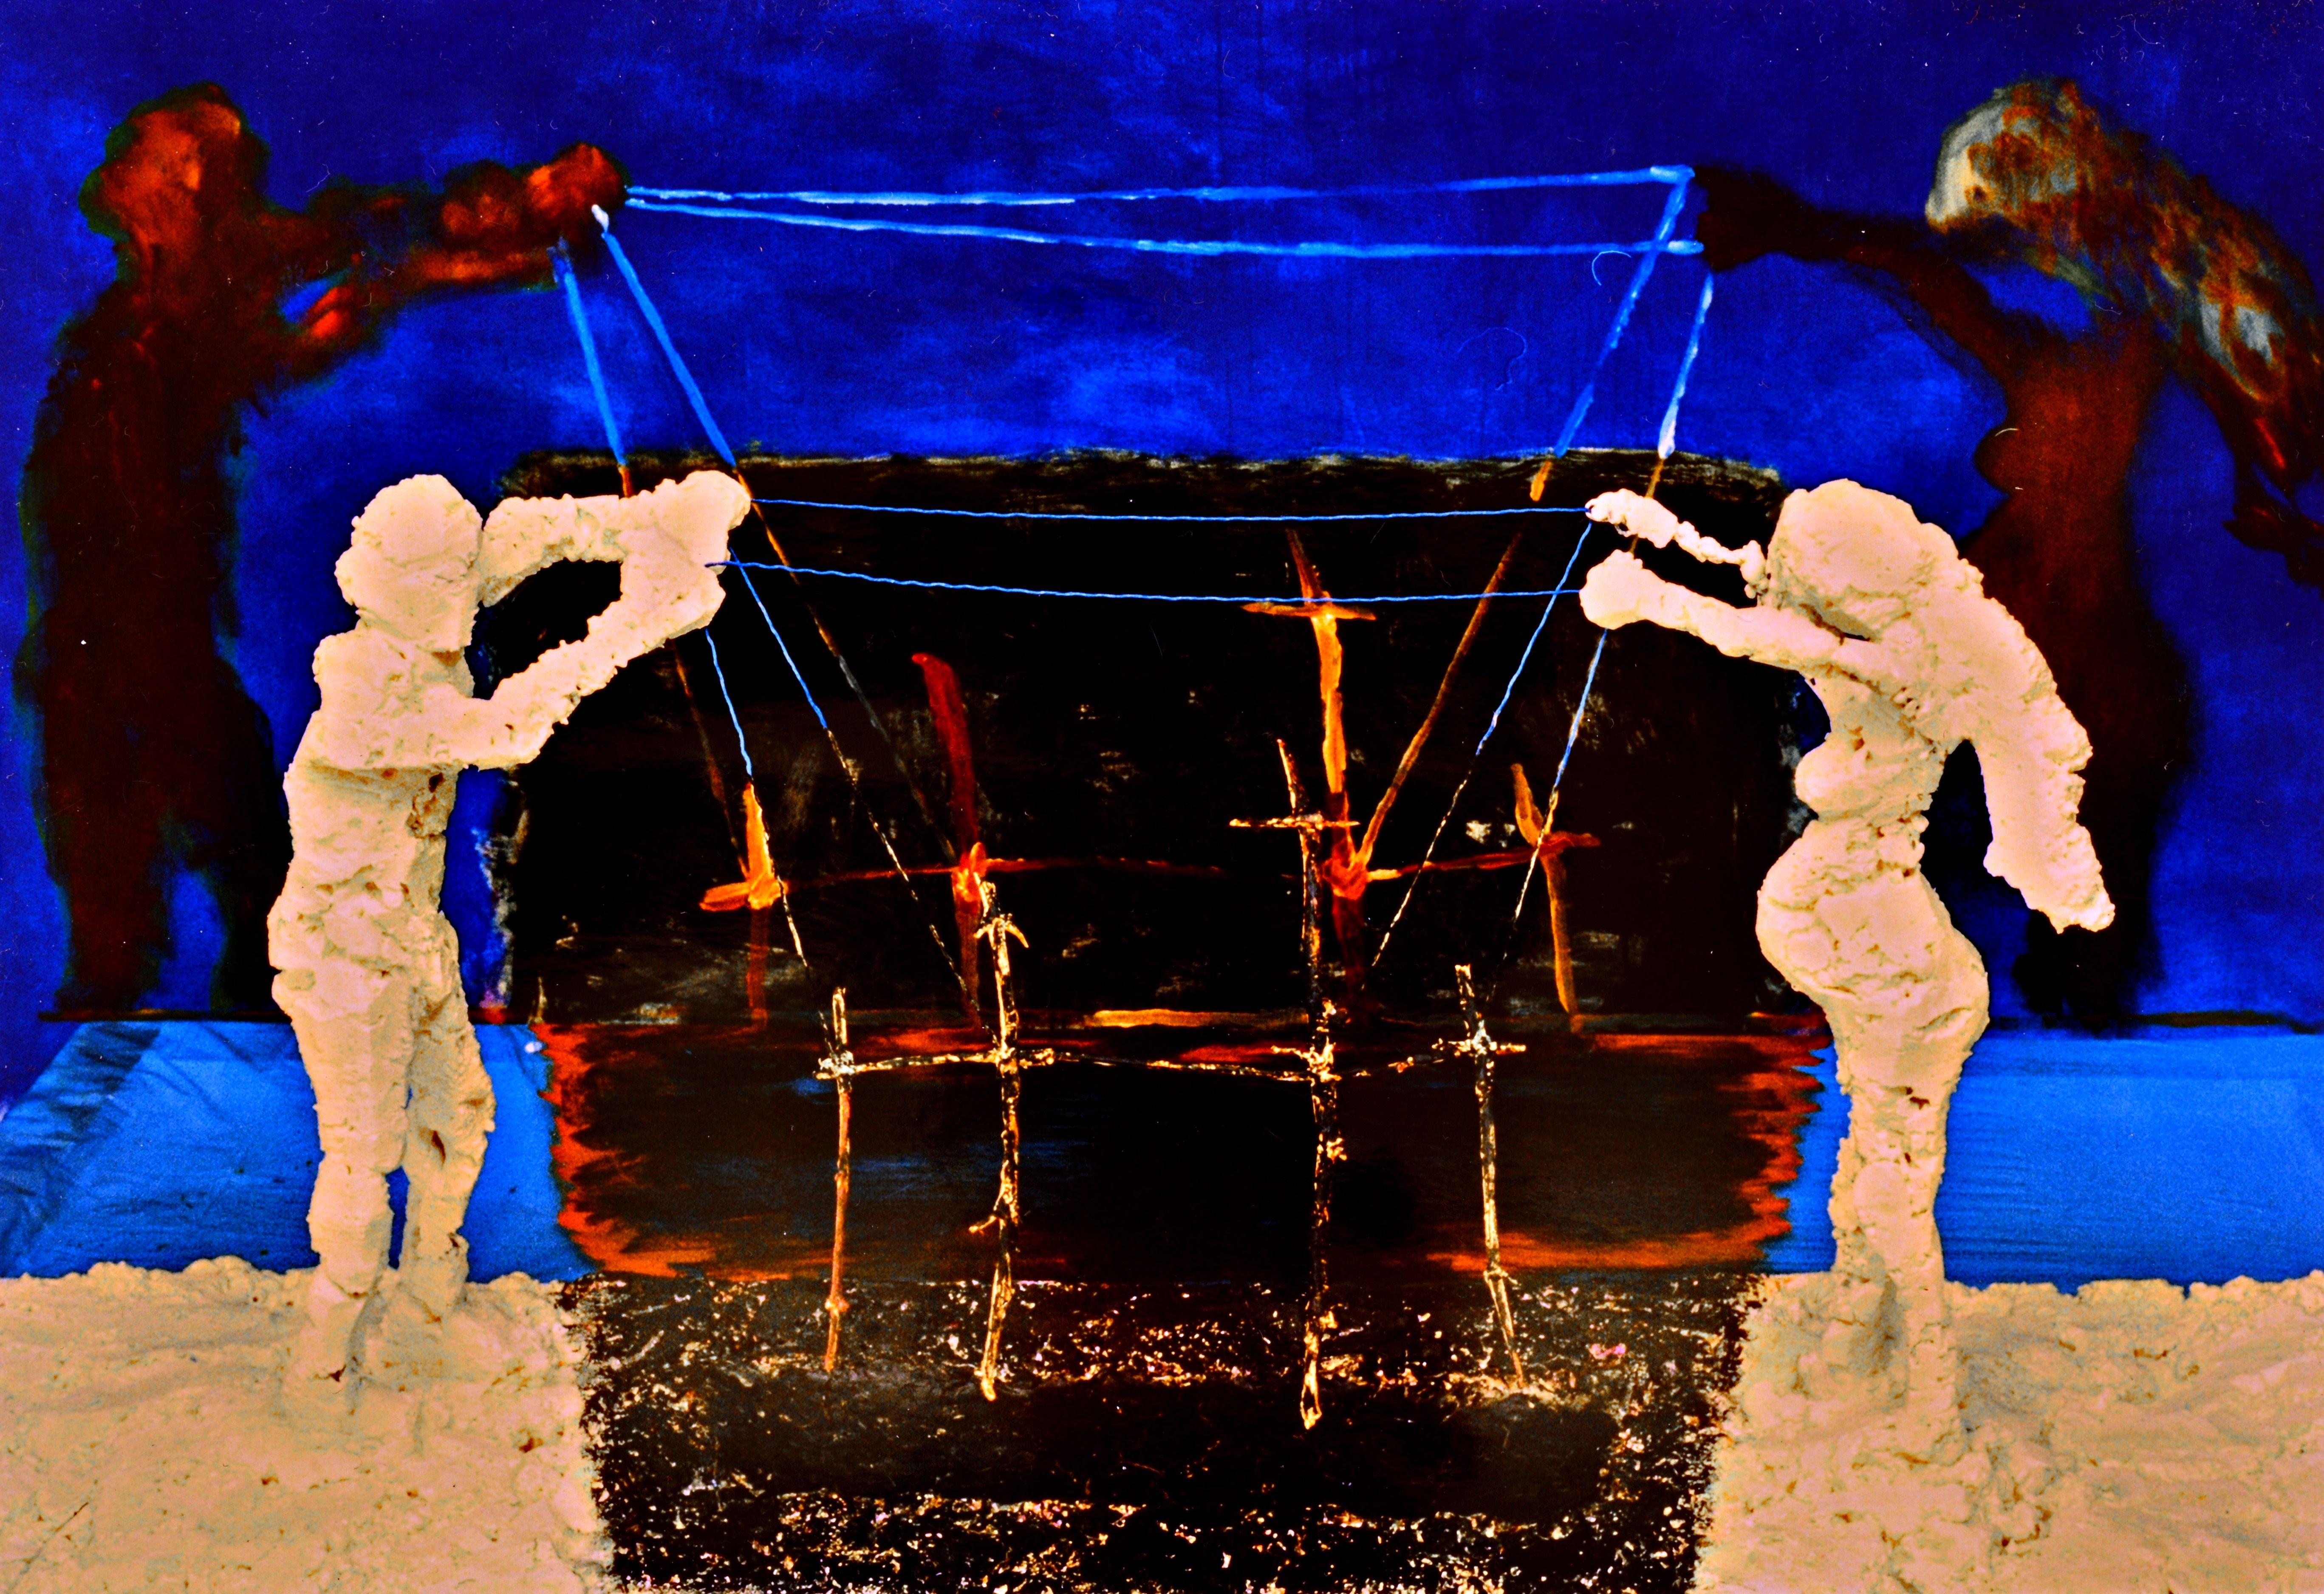 "Yury Ermolenko, work on the movie ""13.ICONOSTASIS"", Rapan Studio, 2003, Krakow, Poland ( ""13.ICONOSTASIS"" project by YuryErmolenko, 2004, L-Art Gallery, Kiev, Ukraine ) #YuryErmolenko #Ermolenko #Ермоленко #юрийермоленко #ЮрийЕрмоленко #живопись #ермоленко #yuryermolenko #выставка #picture #creative #fineart #contemporaryart #modernart #impressive #expressive #texture #RapanStudio #picture #colorful #metaphysics #metaphysical #picture #painting #art #современноеискусство #exhibition #oil"